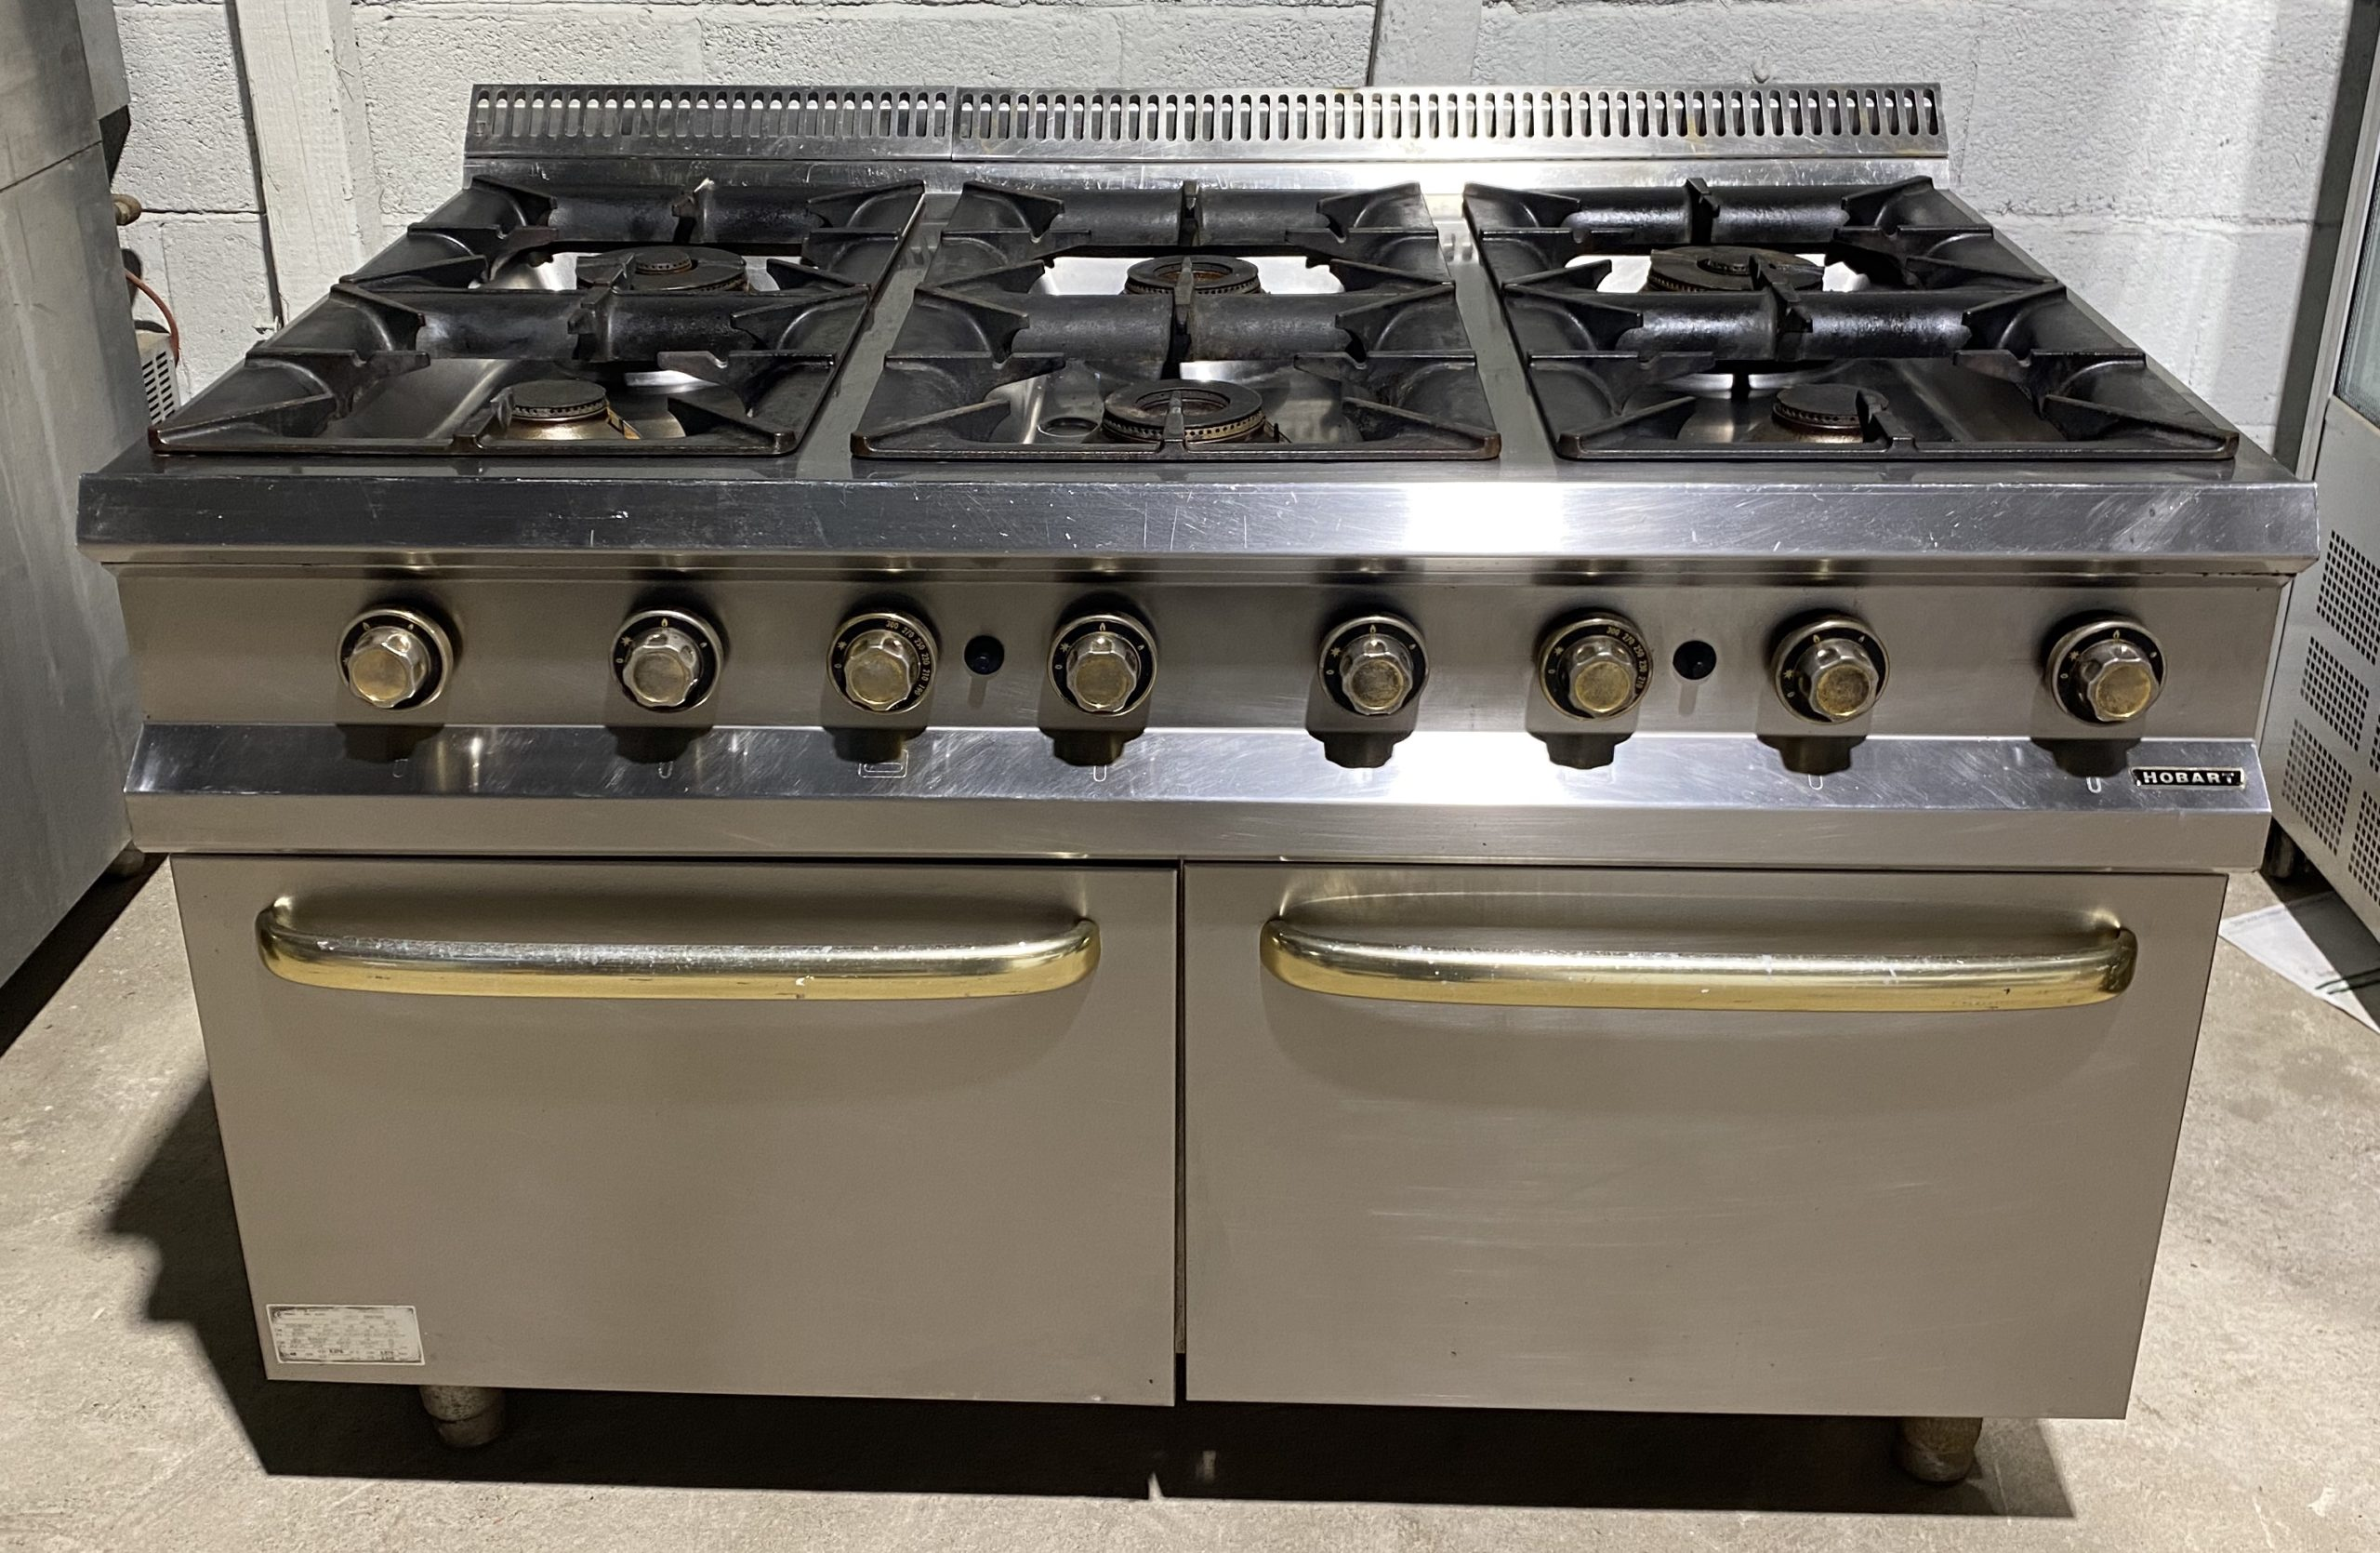 Hobart Extra Wide 6 Burner Range with Twin Ovens